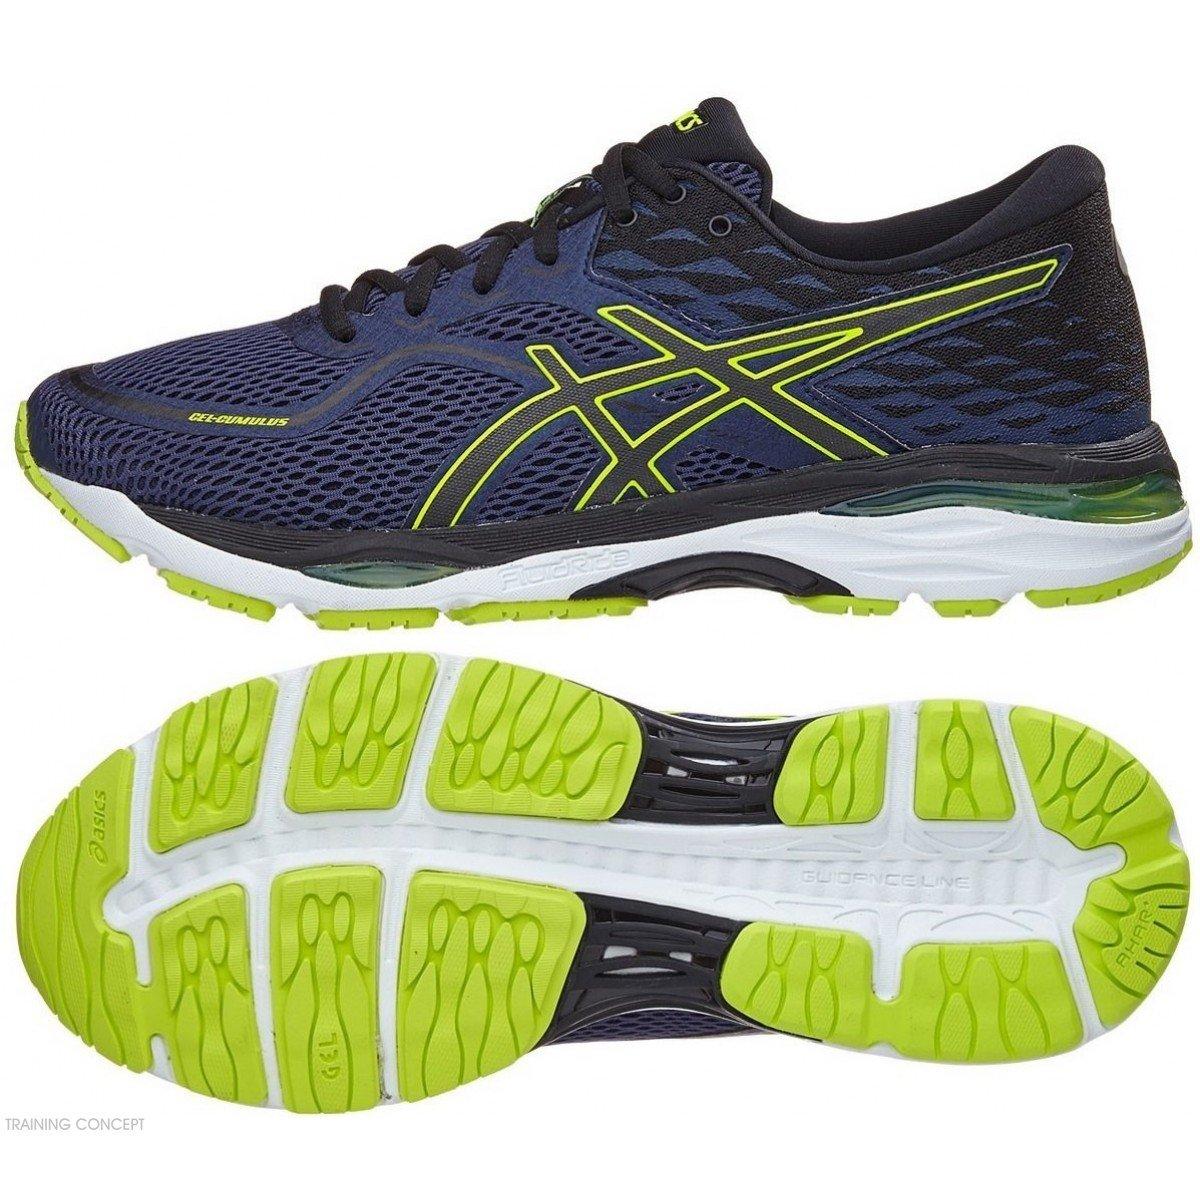 Homme Pour Et Trail Chaussures De Running Route wqfx6ZY6 b8dce3f7bee76